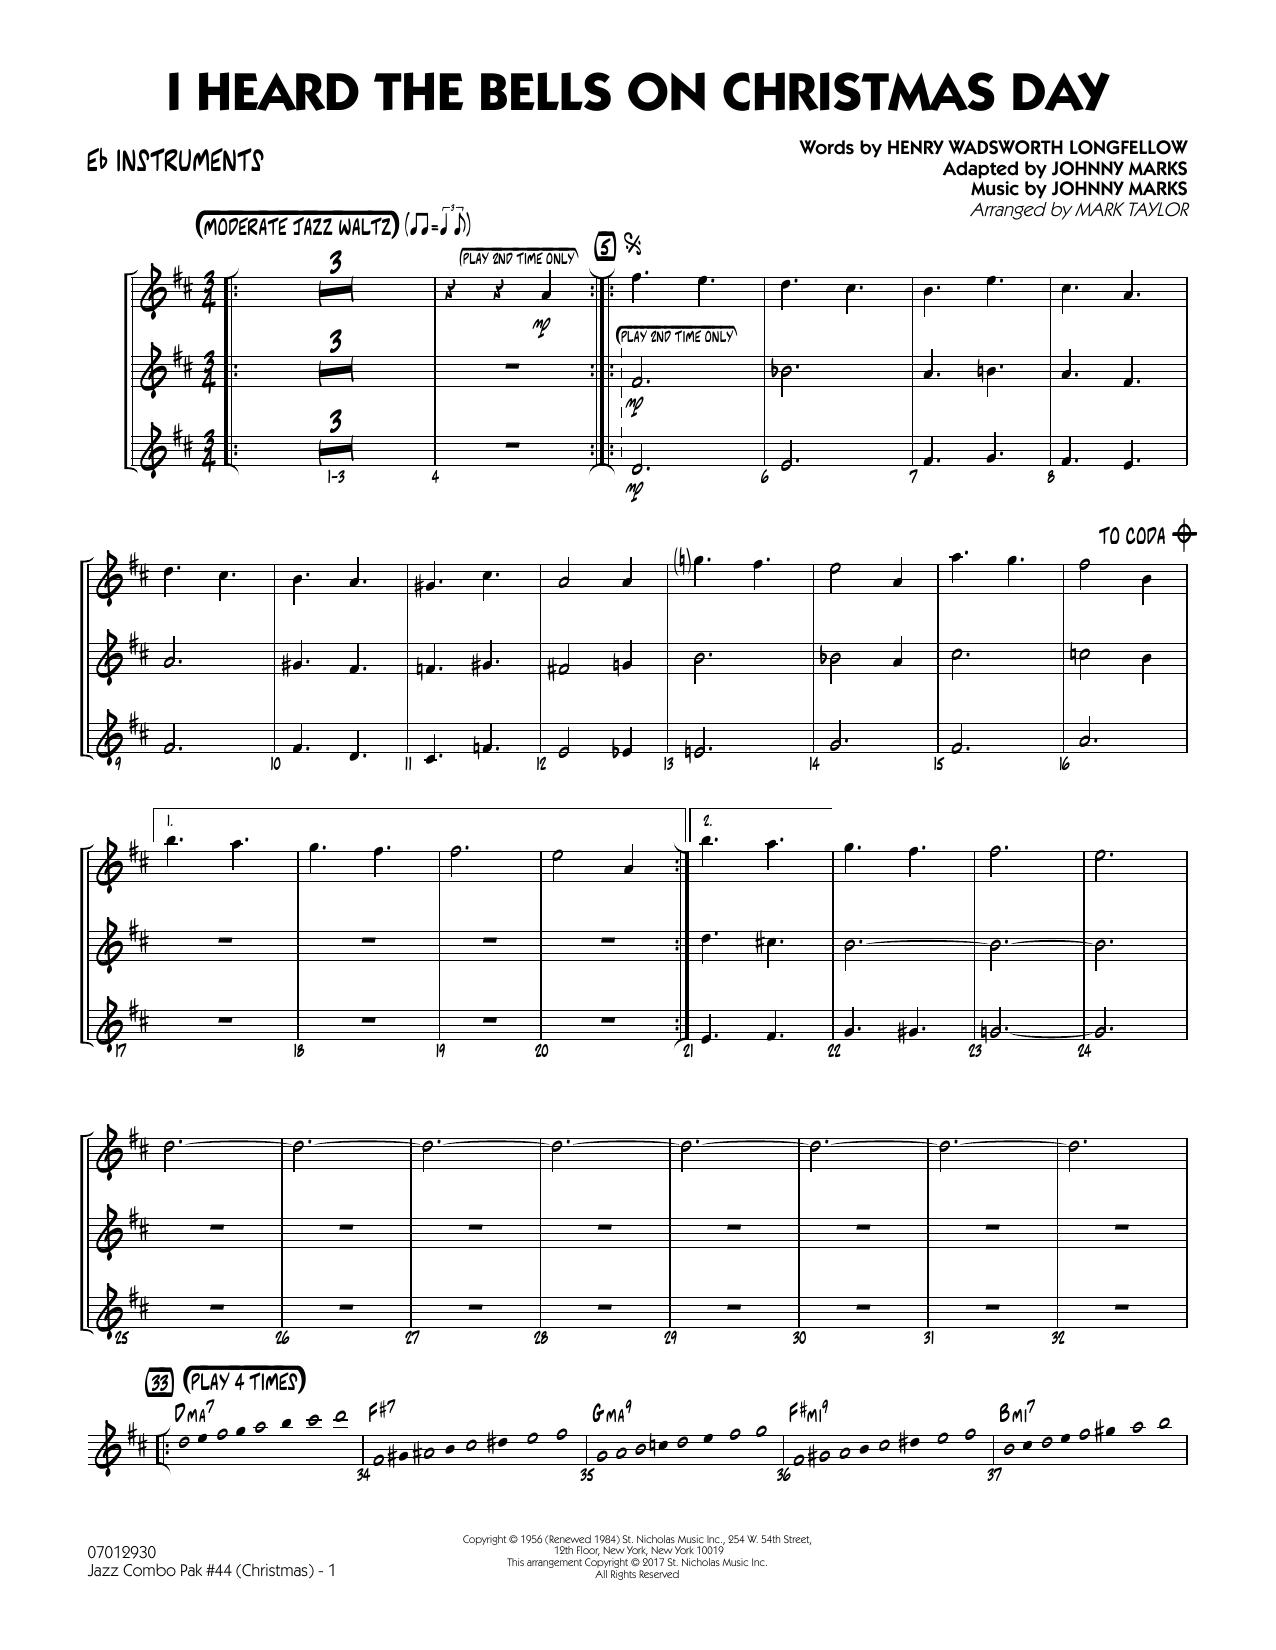 Mark Taylor Jazz Combo Pak #44 (Christmas) - Eb Instruments sheet music notes and chords. Download Printable PDF.